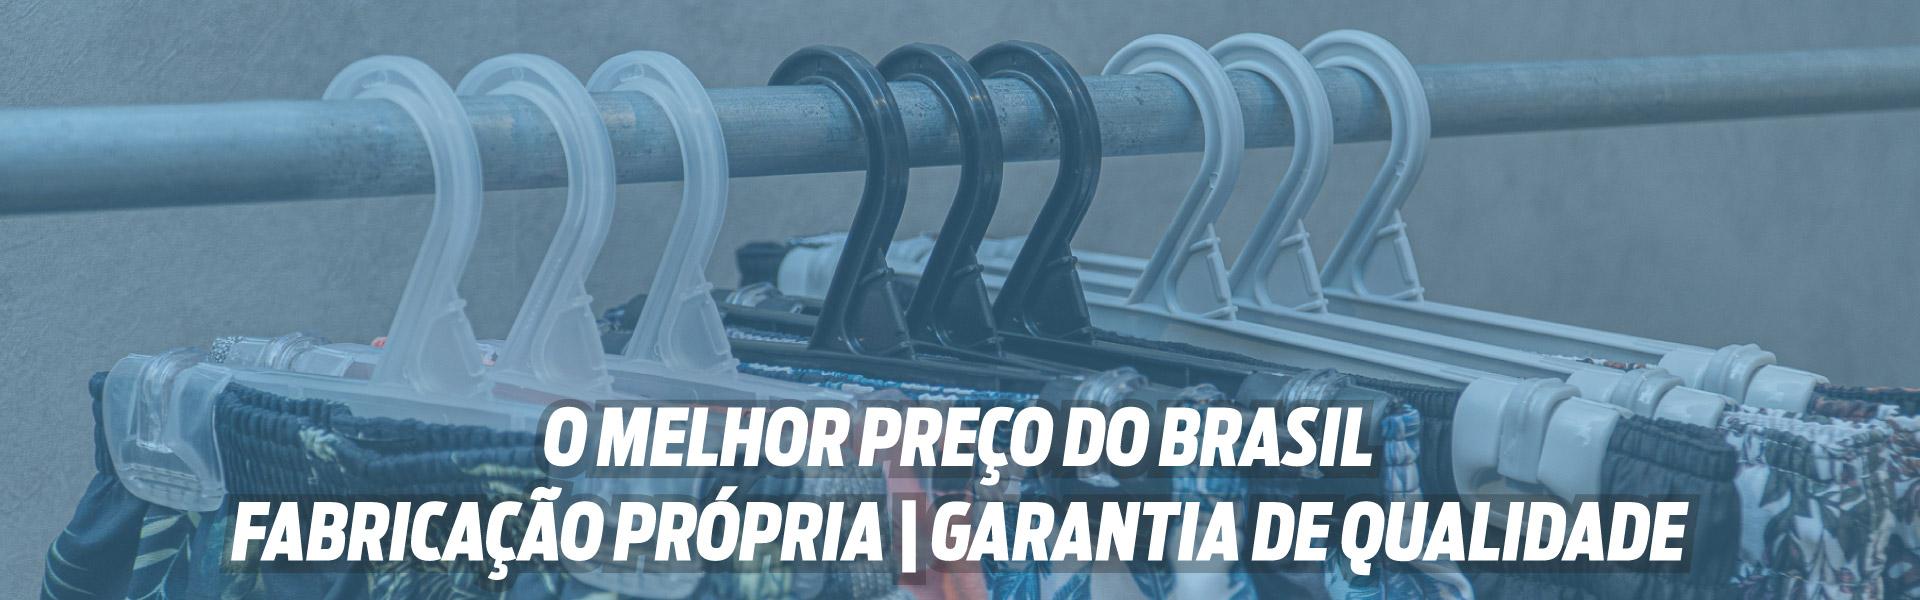 Banner Novo 2